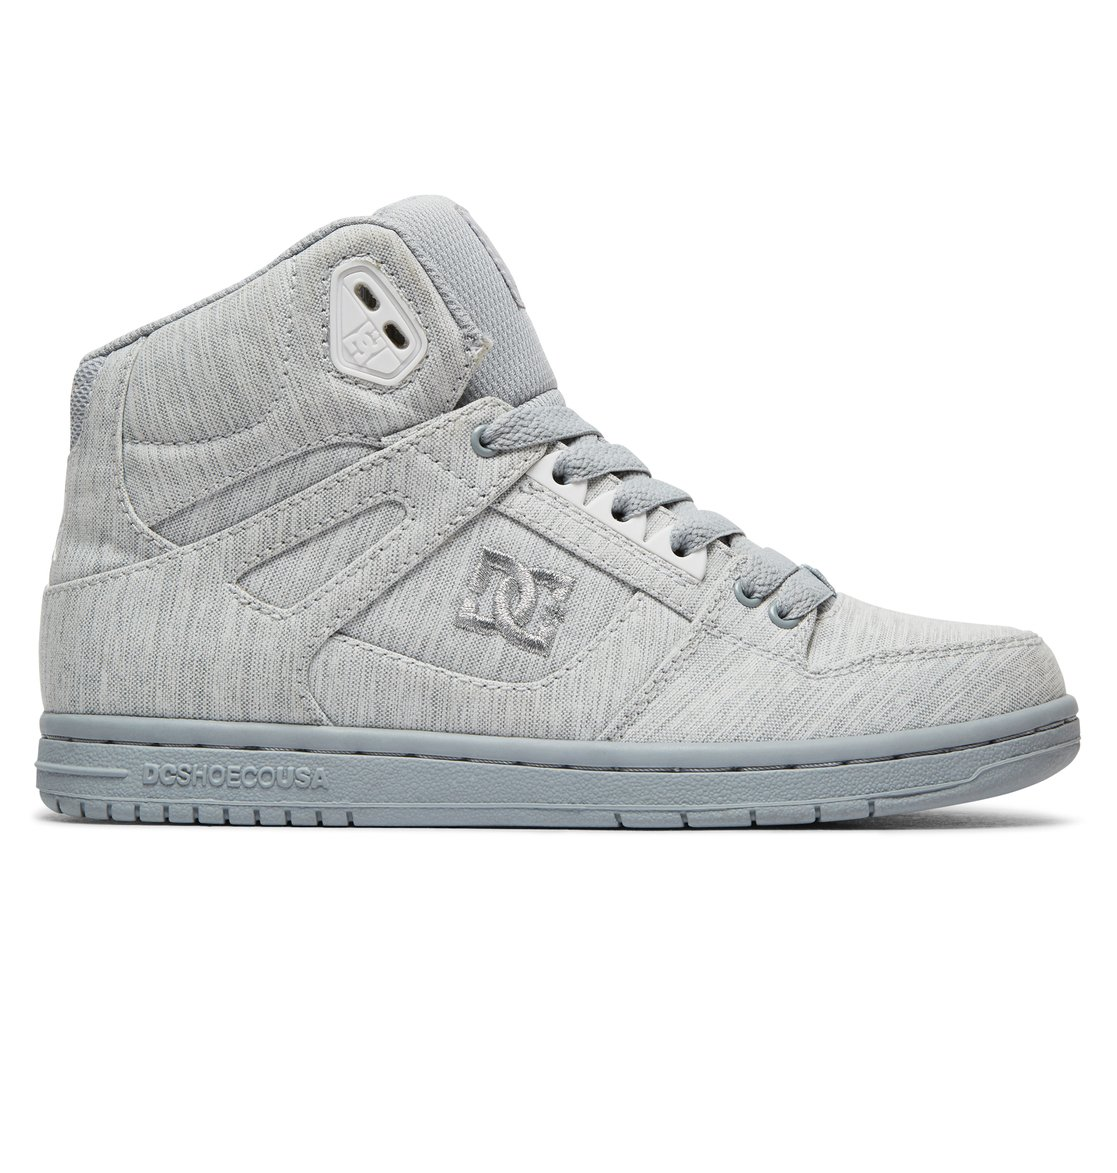 f83702f93fda09 0 Pure TX SE - High-Top Shoes for Women ADJS100115 DC Shoes